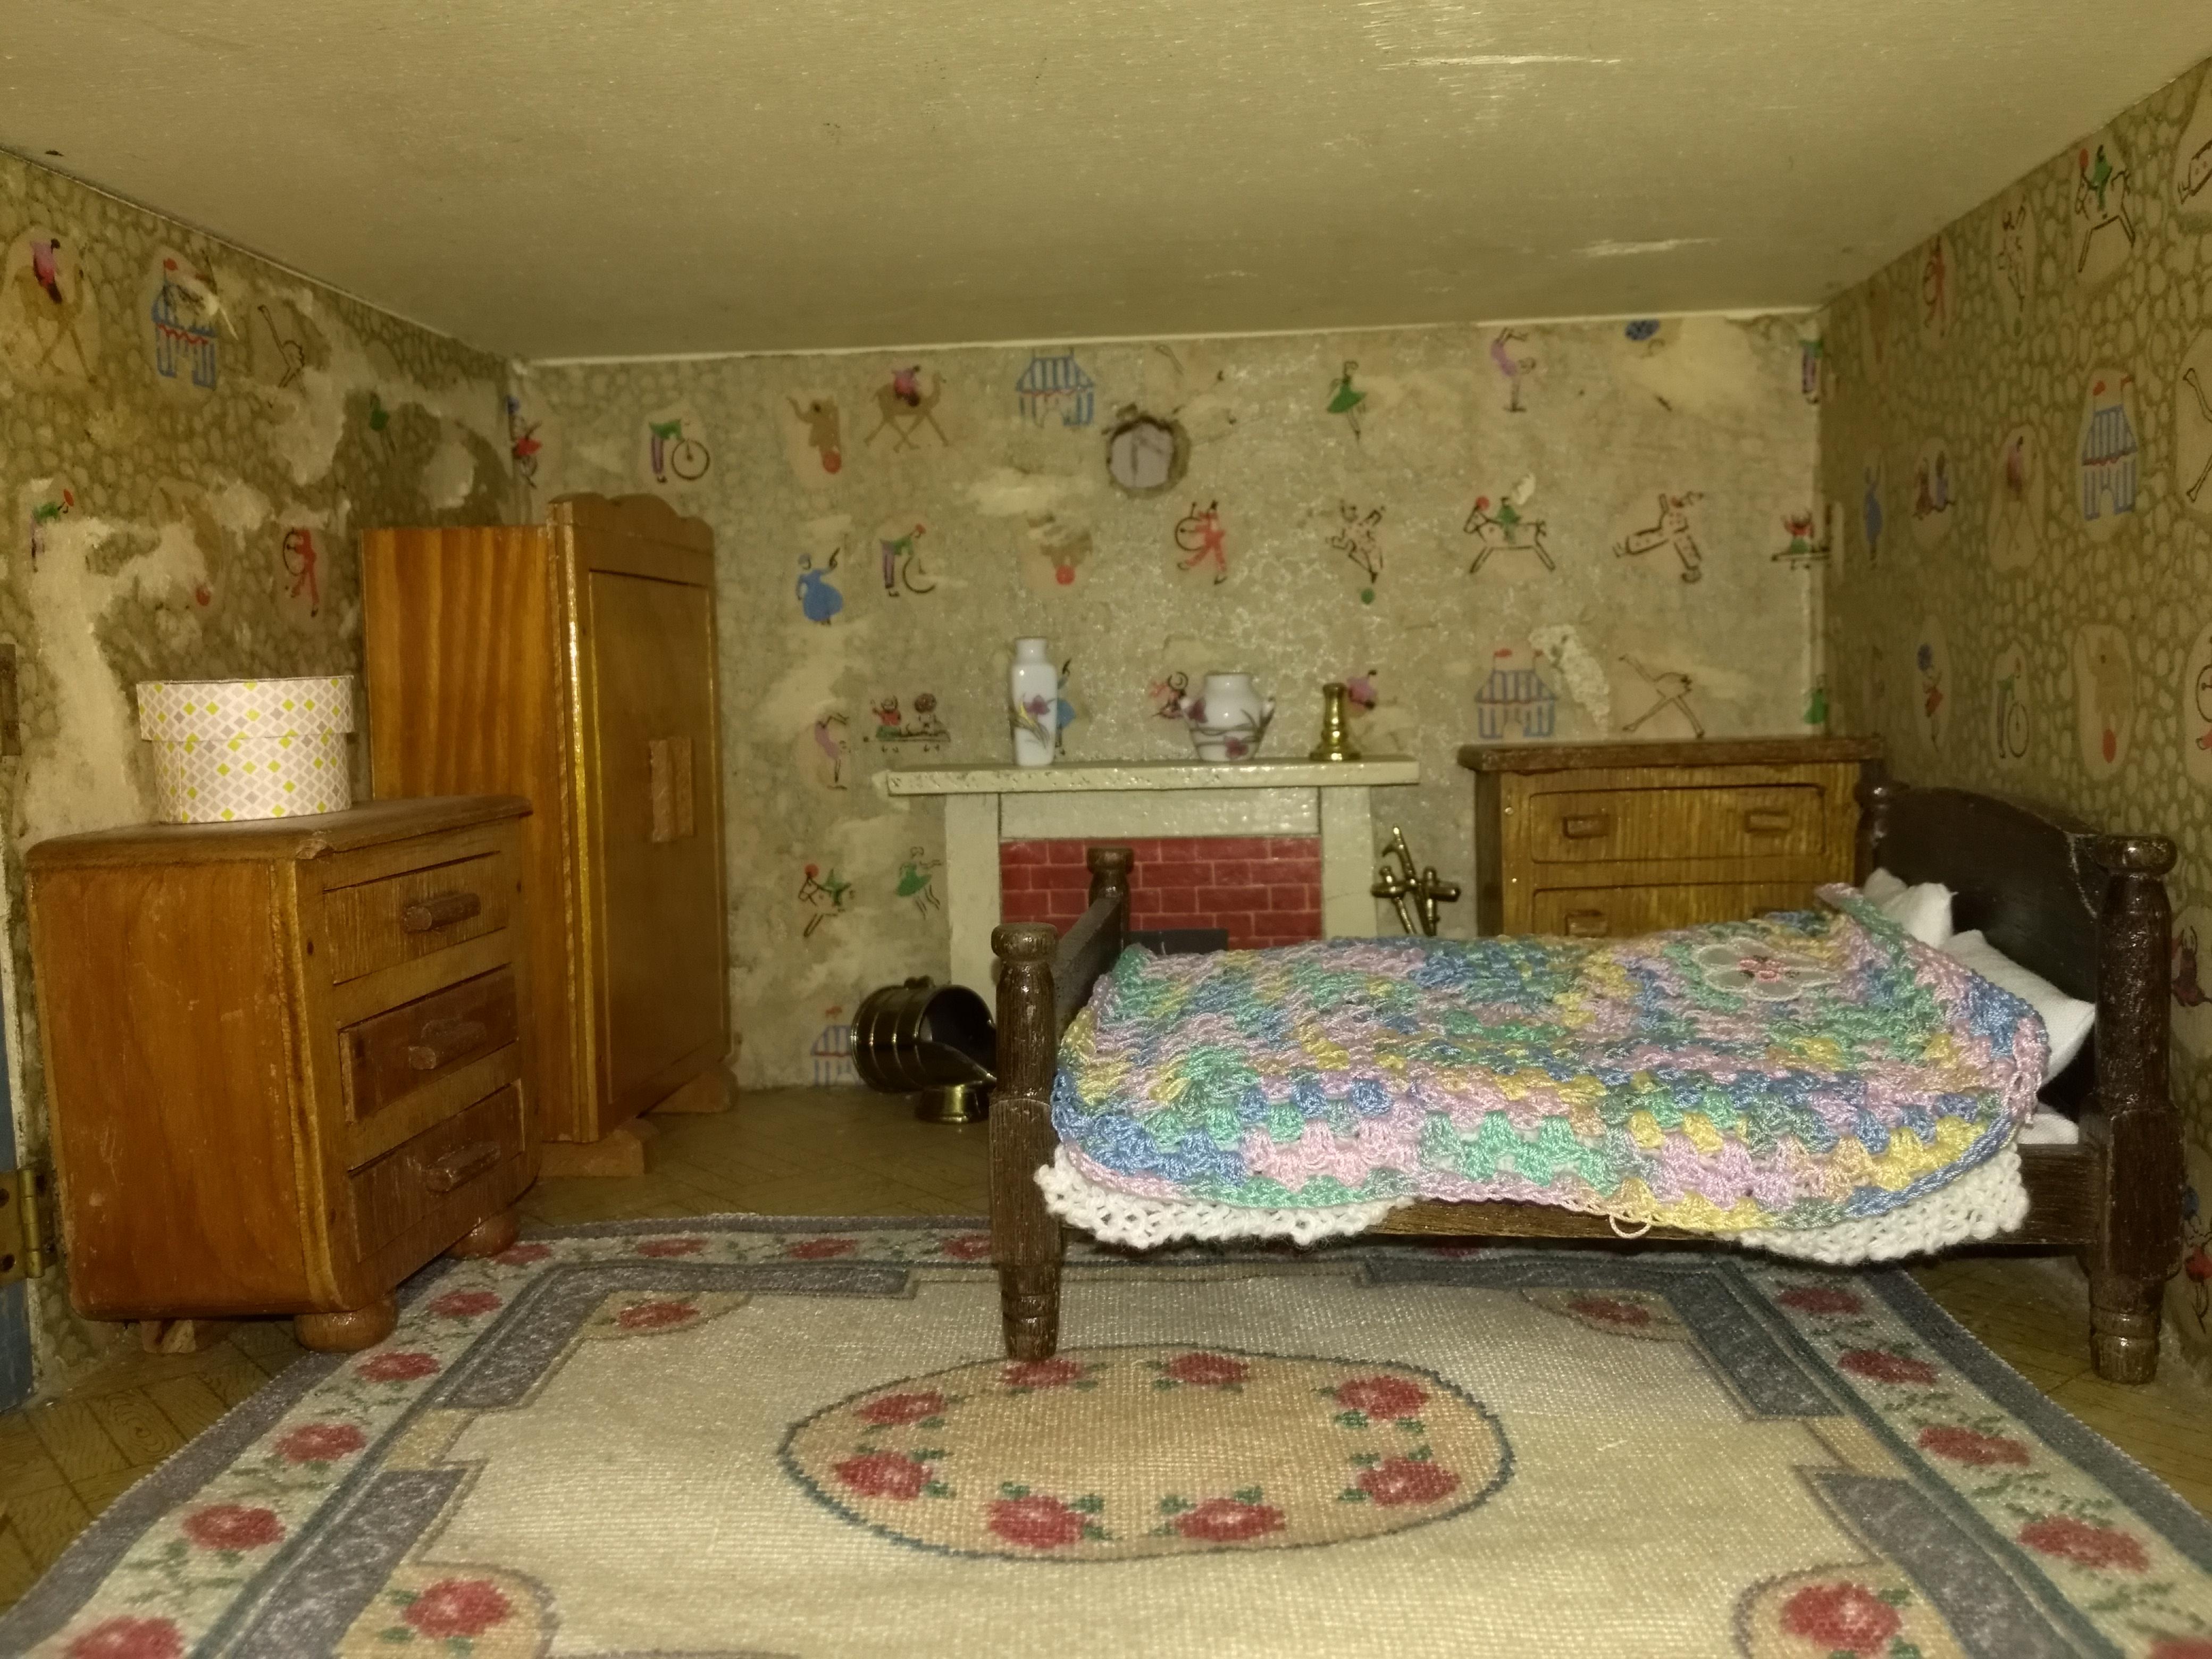 Grandma and grandads bedroom